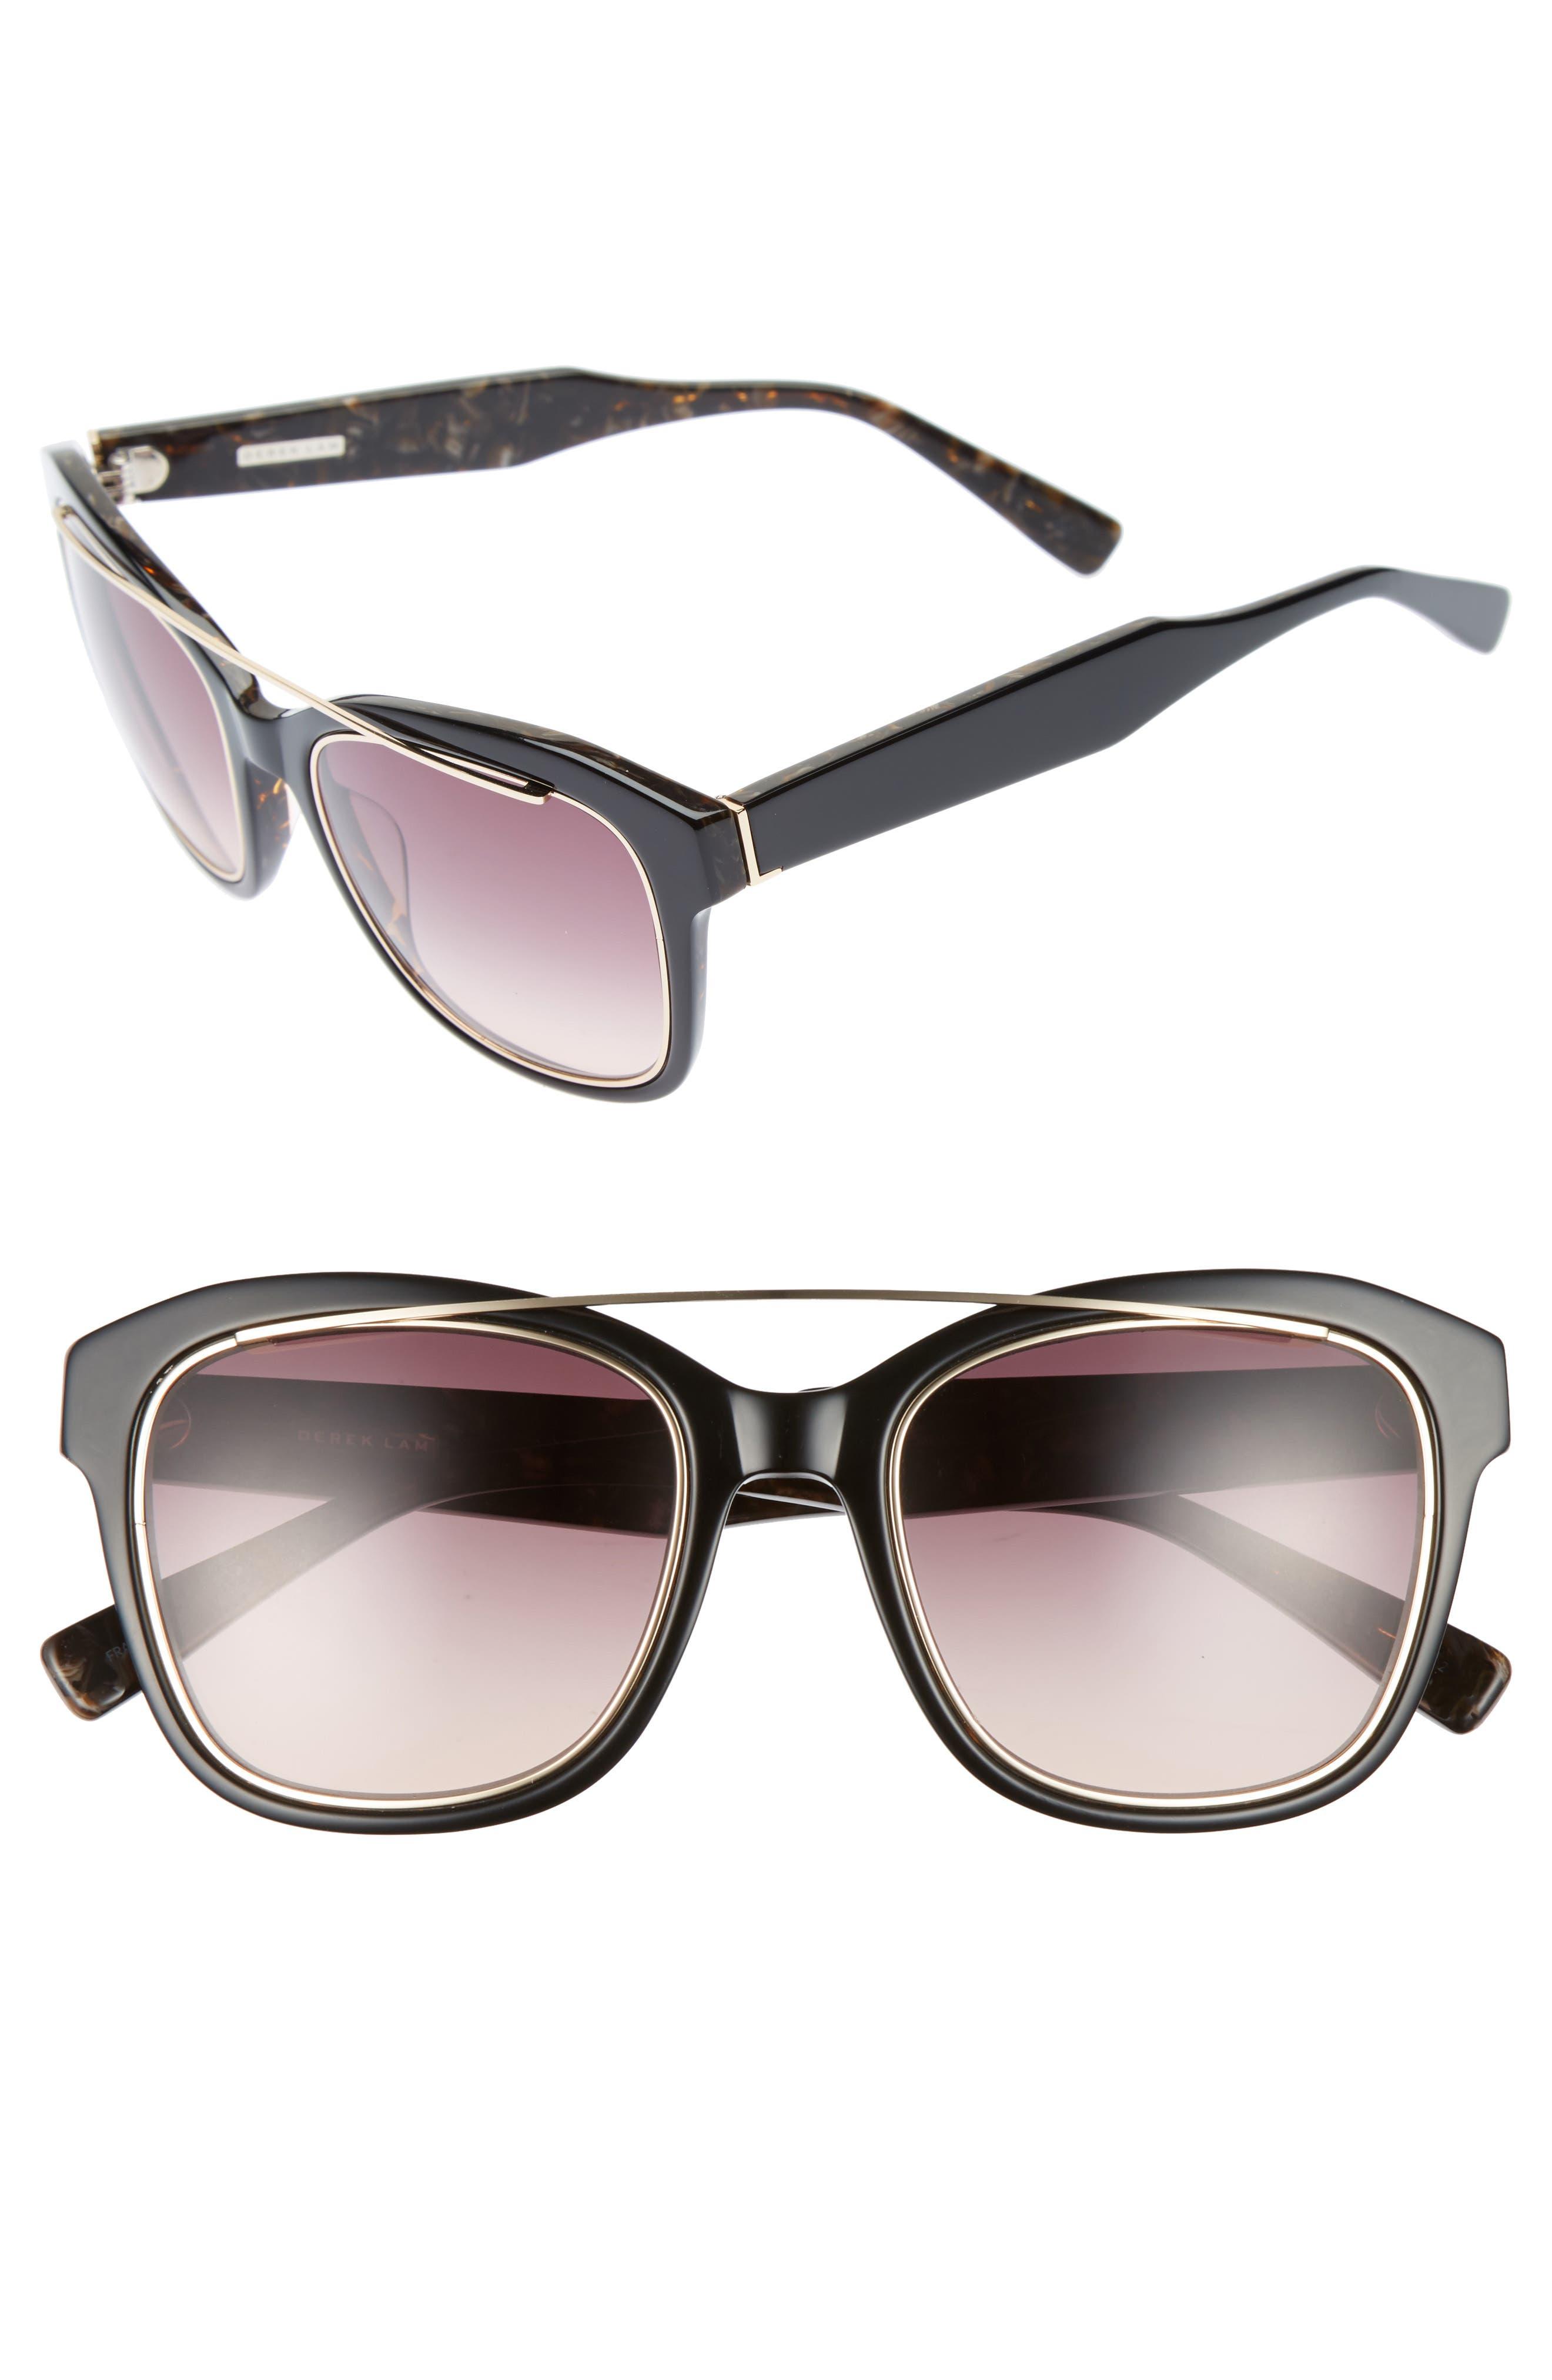 DEREK LAM,                             Hudson 52mm Gradient Sunglasses,                             Main thumbnail 1, color,                             001